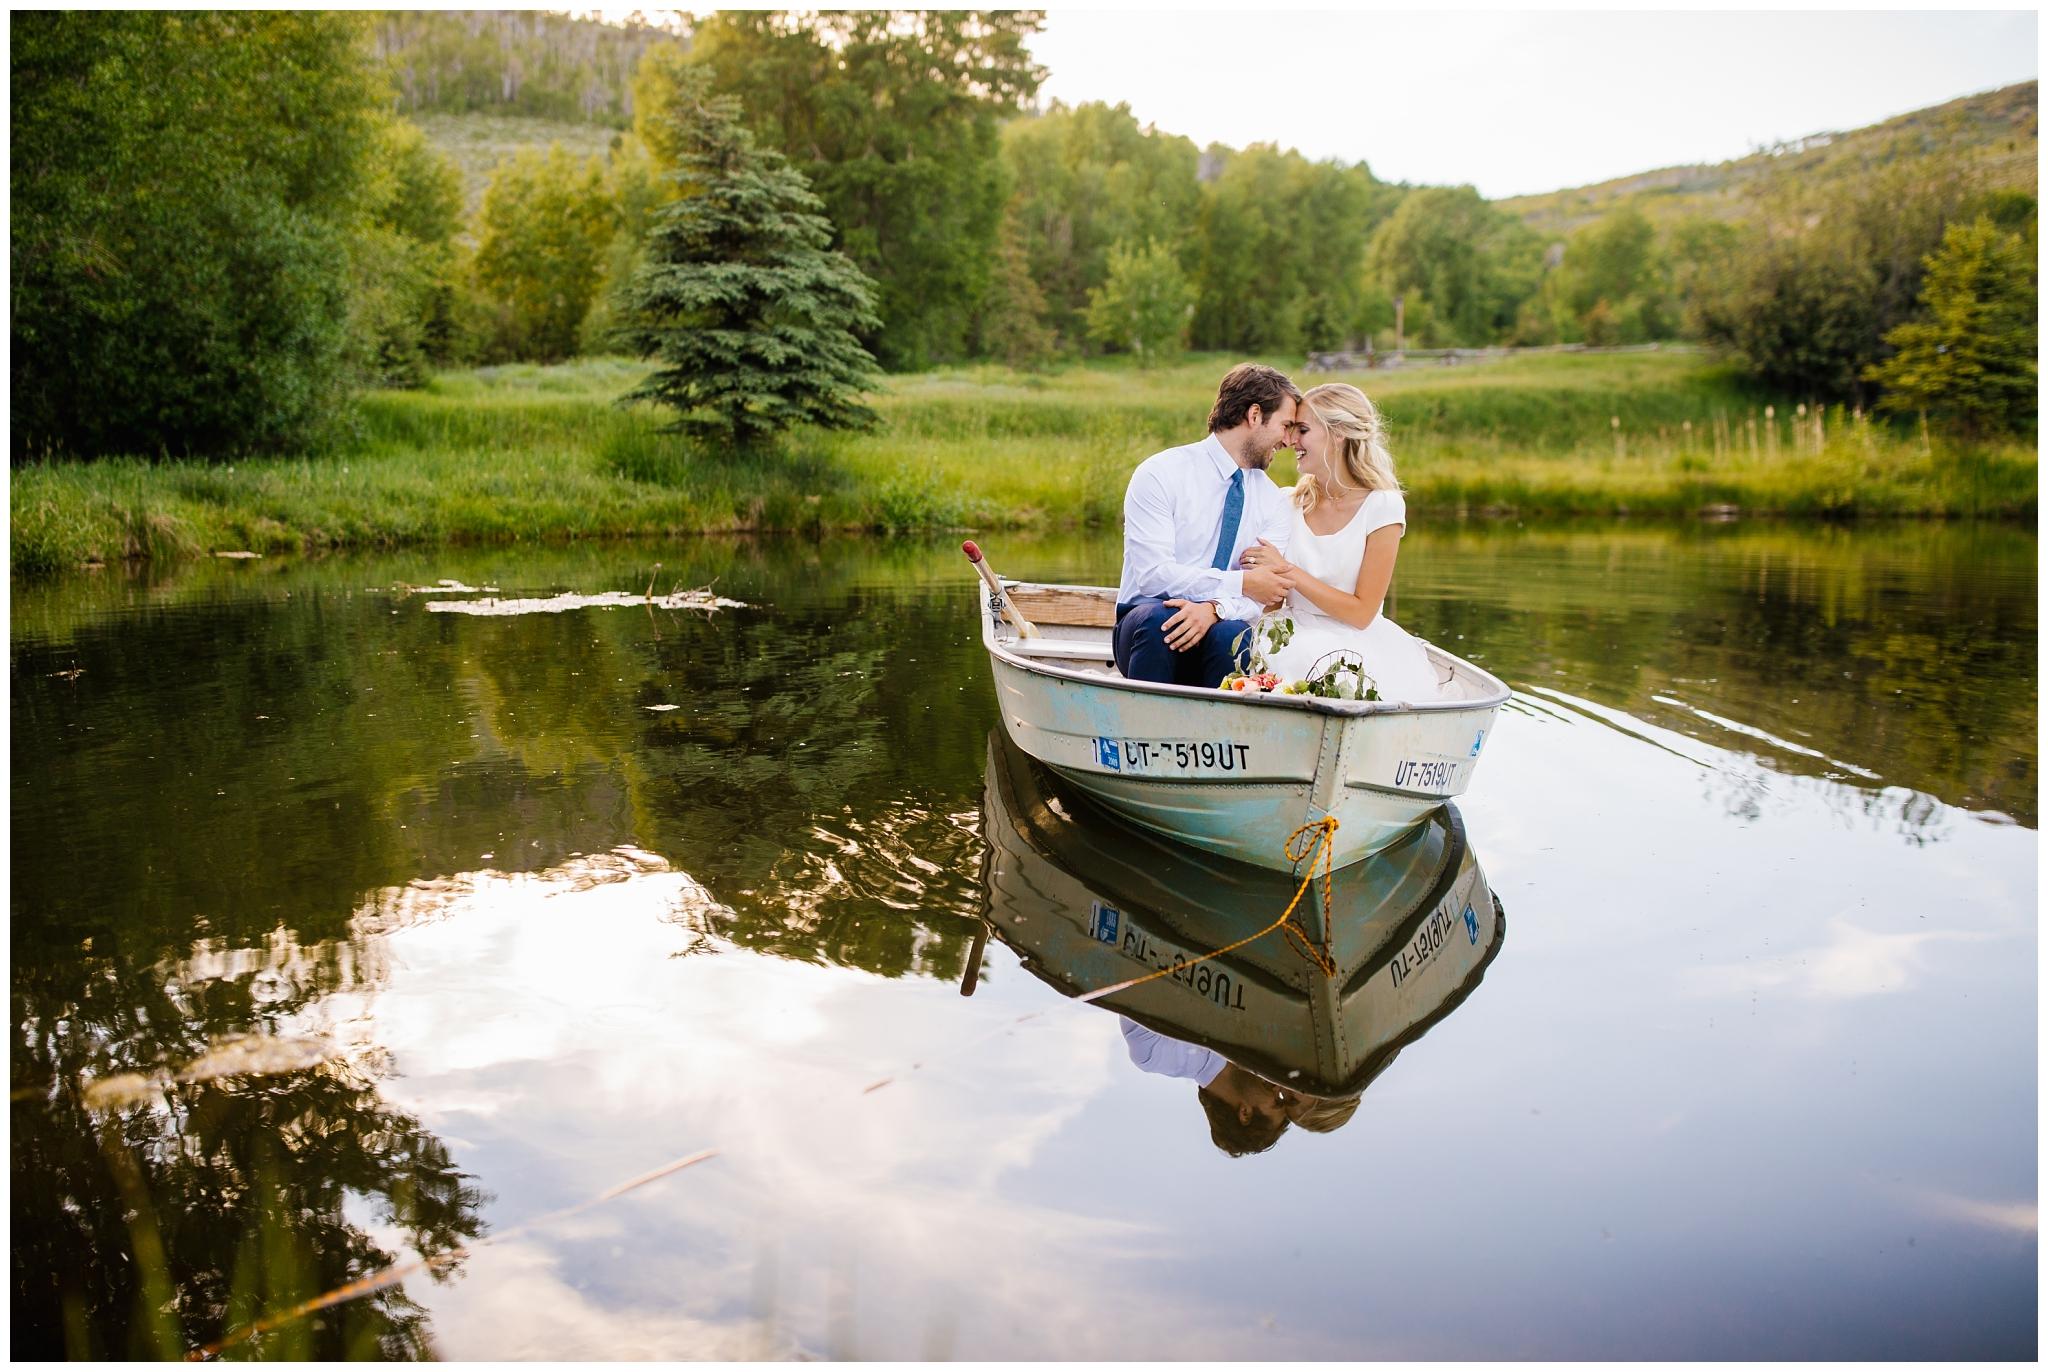 Lizzie-B-Imagery-Utah-Wedding-Photographer-Park-City-Photographer_0045.jpg